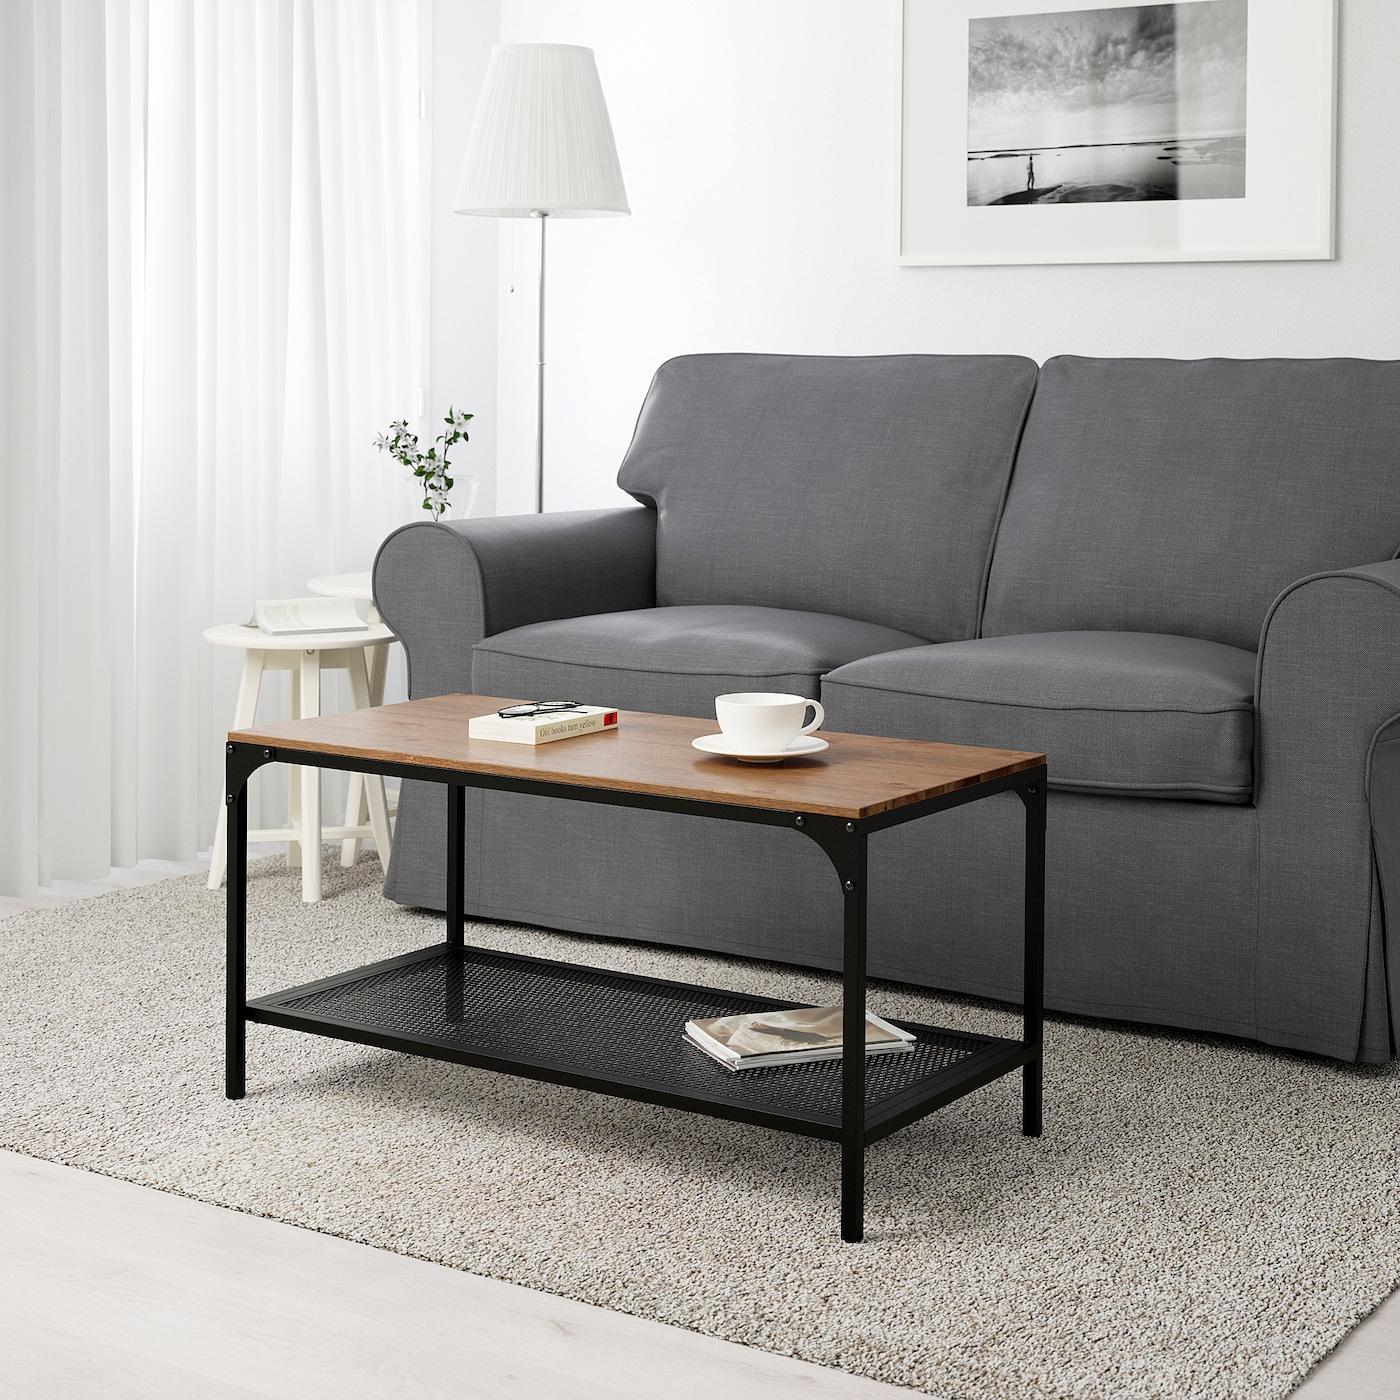 Fjallbo Coffee Table Black 90x46 Cm Ikea Ireland [ 1400 x 1400 Pixel ]